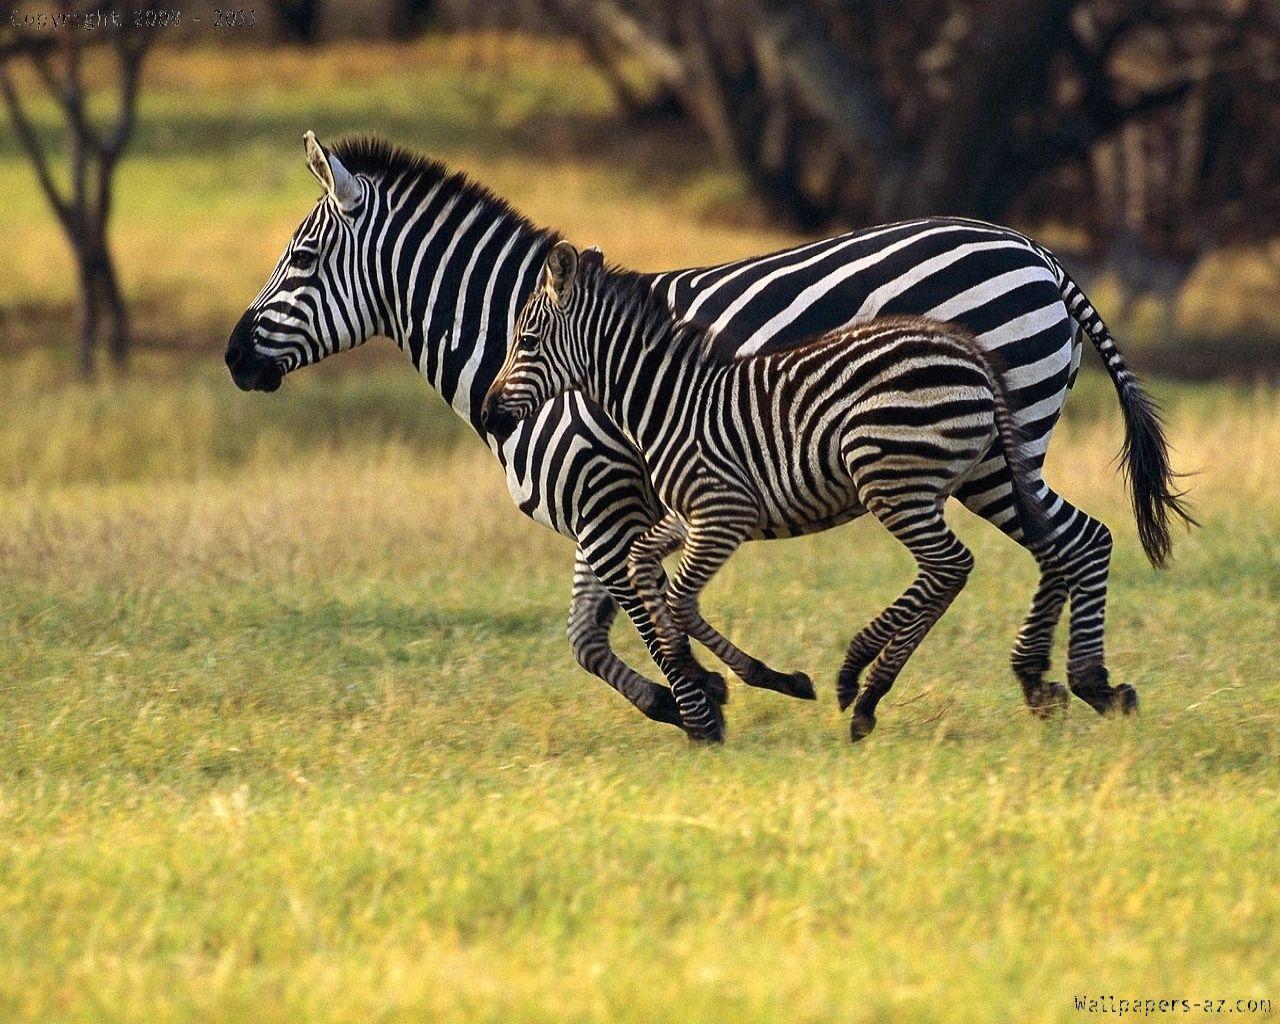 Mom And Baby Zebras Running Together Animals Beautiful Animals Wild African Animals